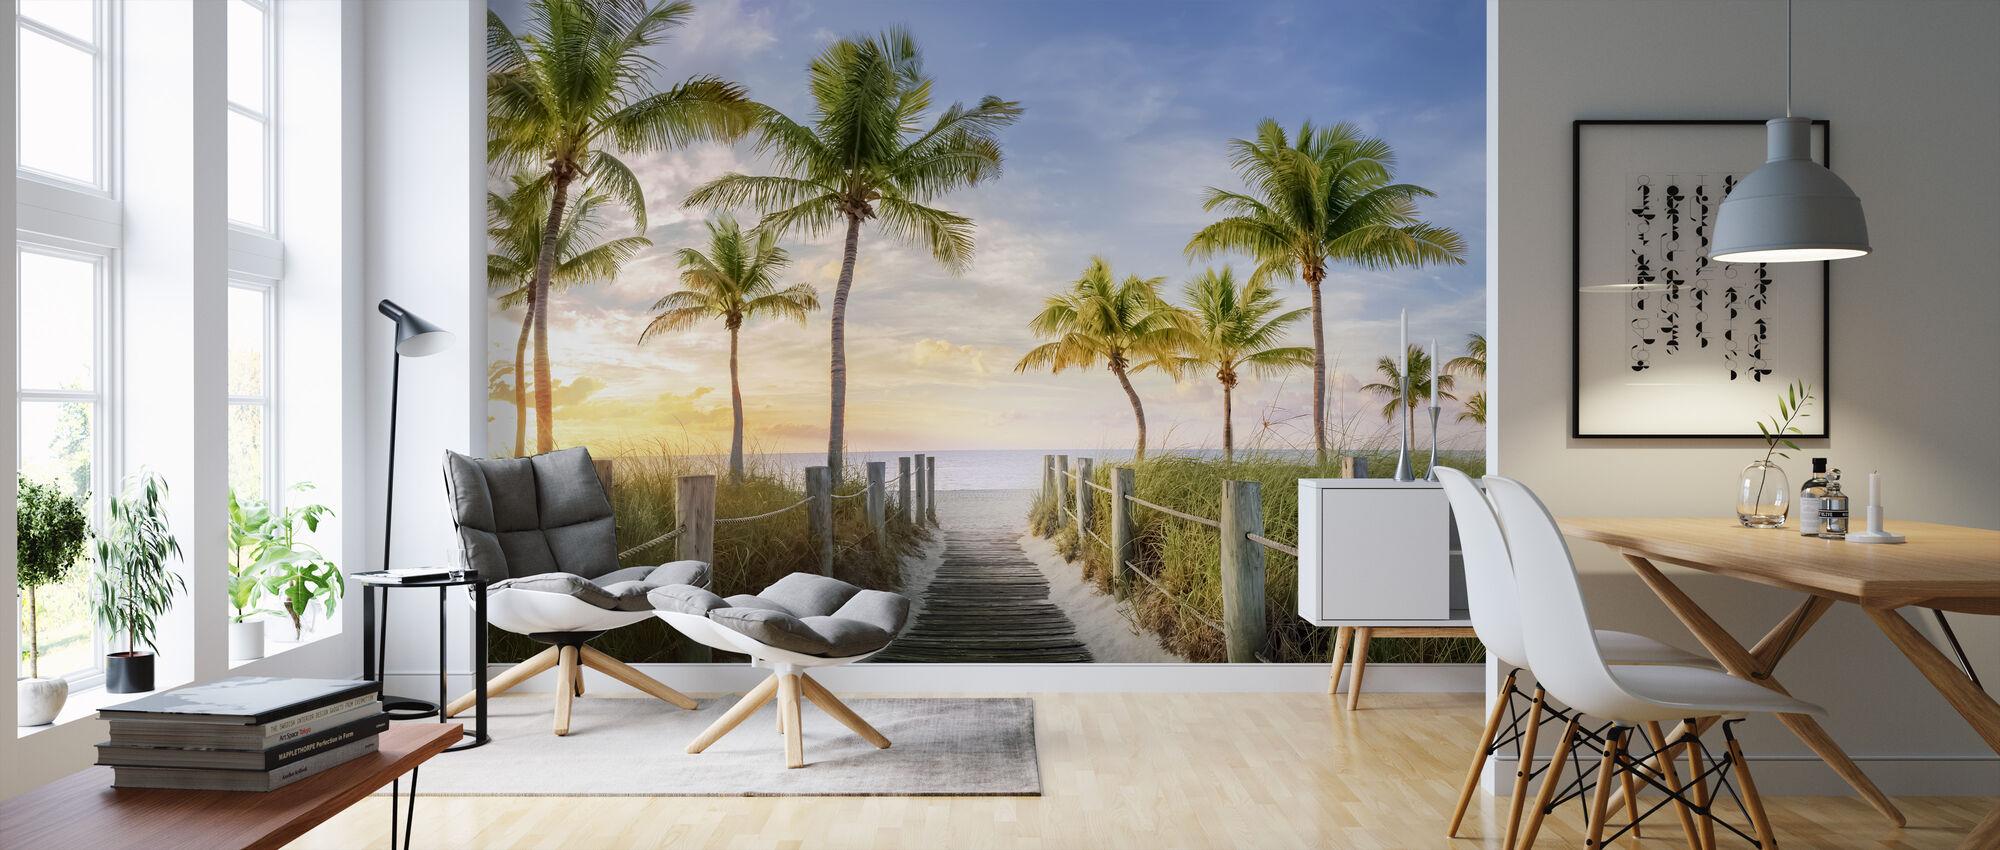 Footbridge to the Beach - Wallpaper - Living Room